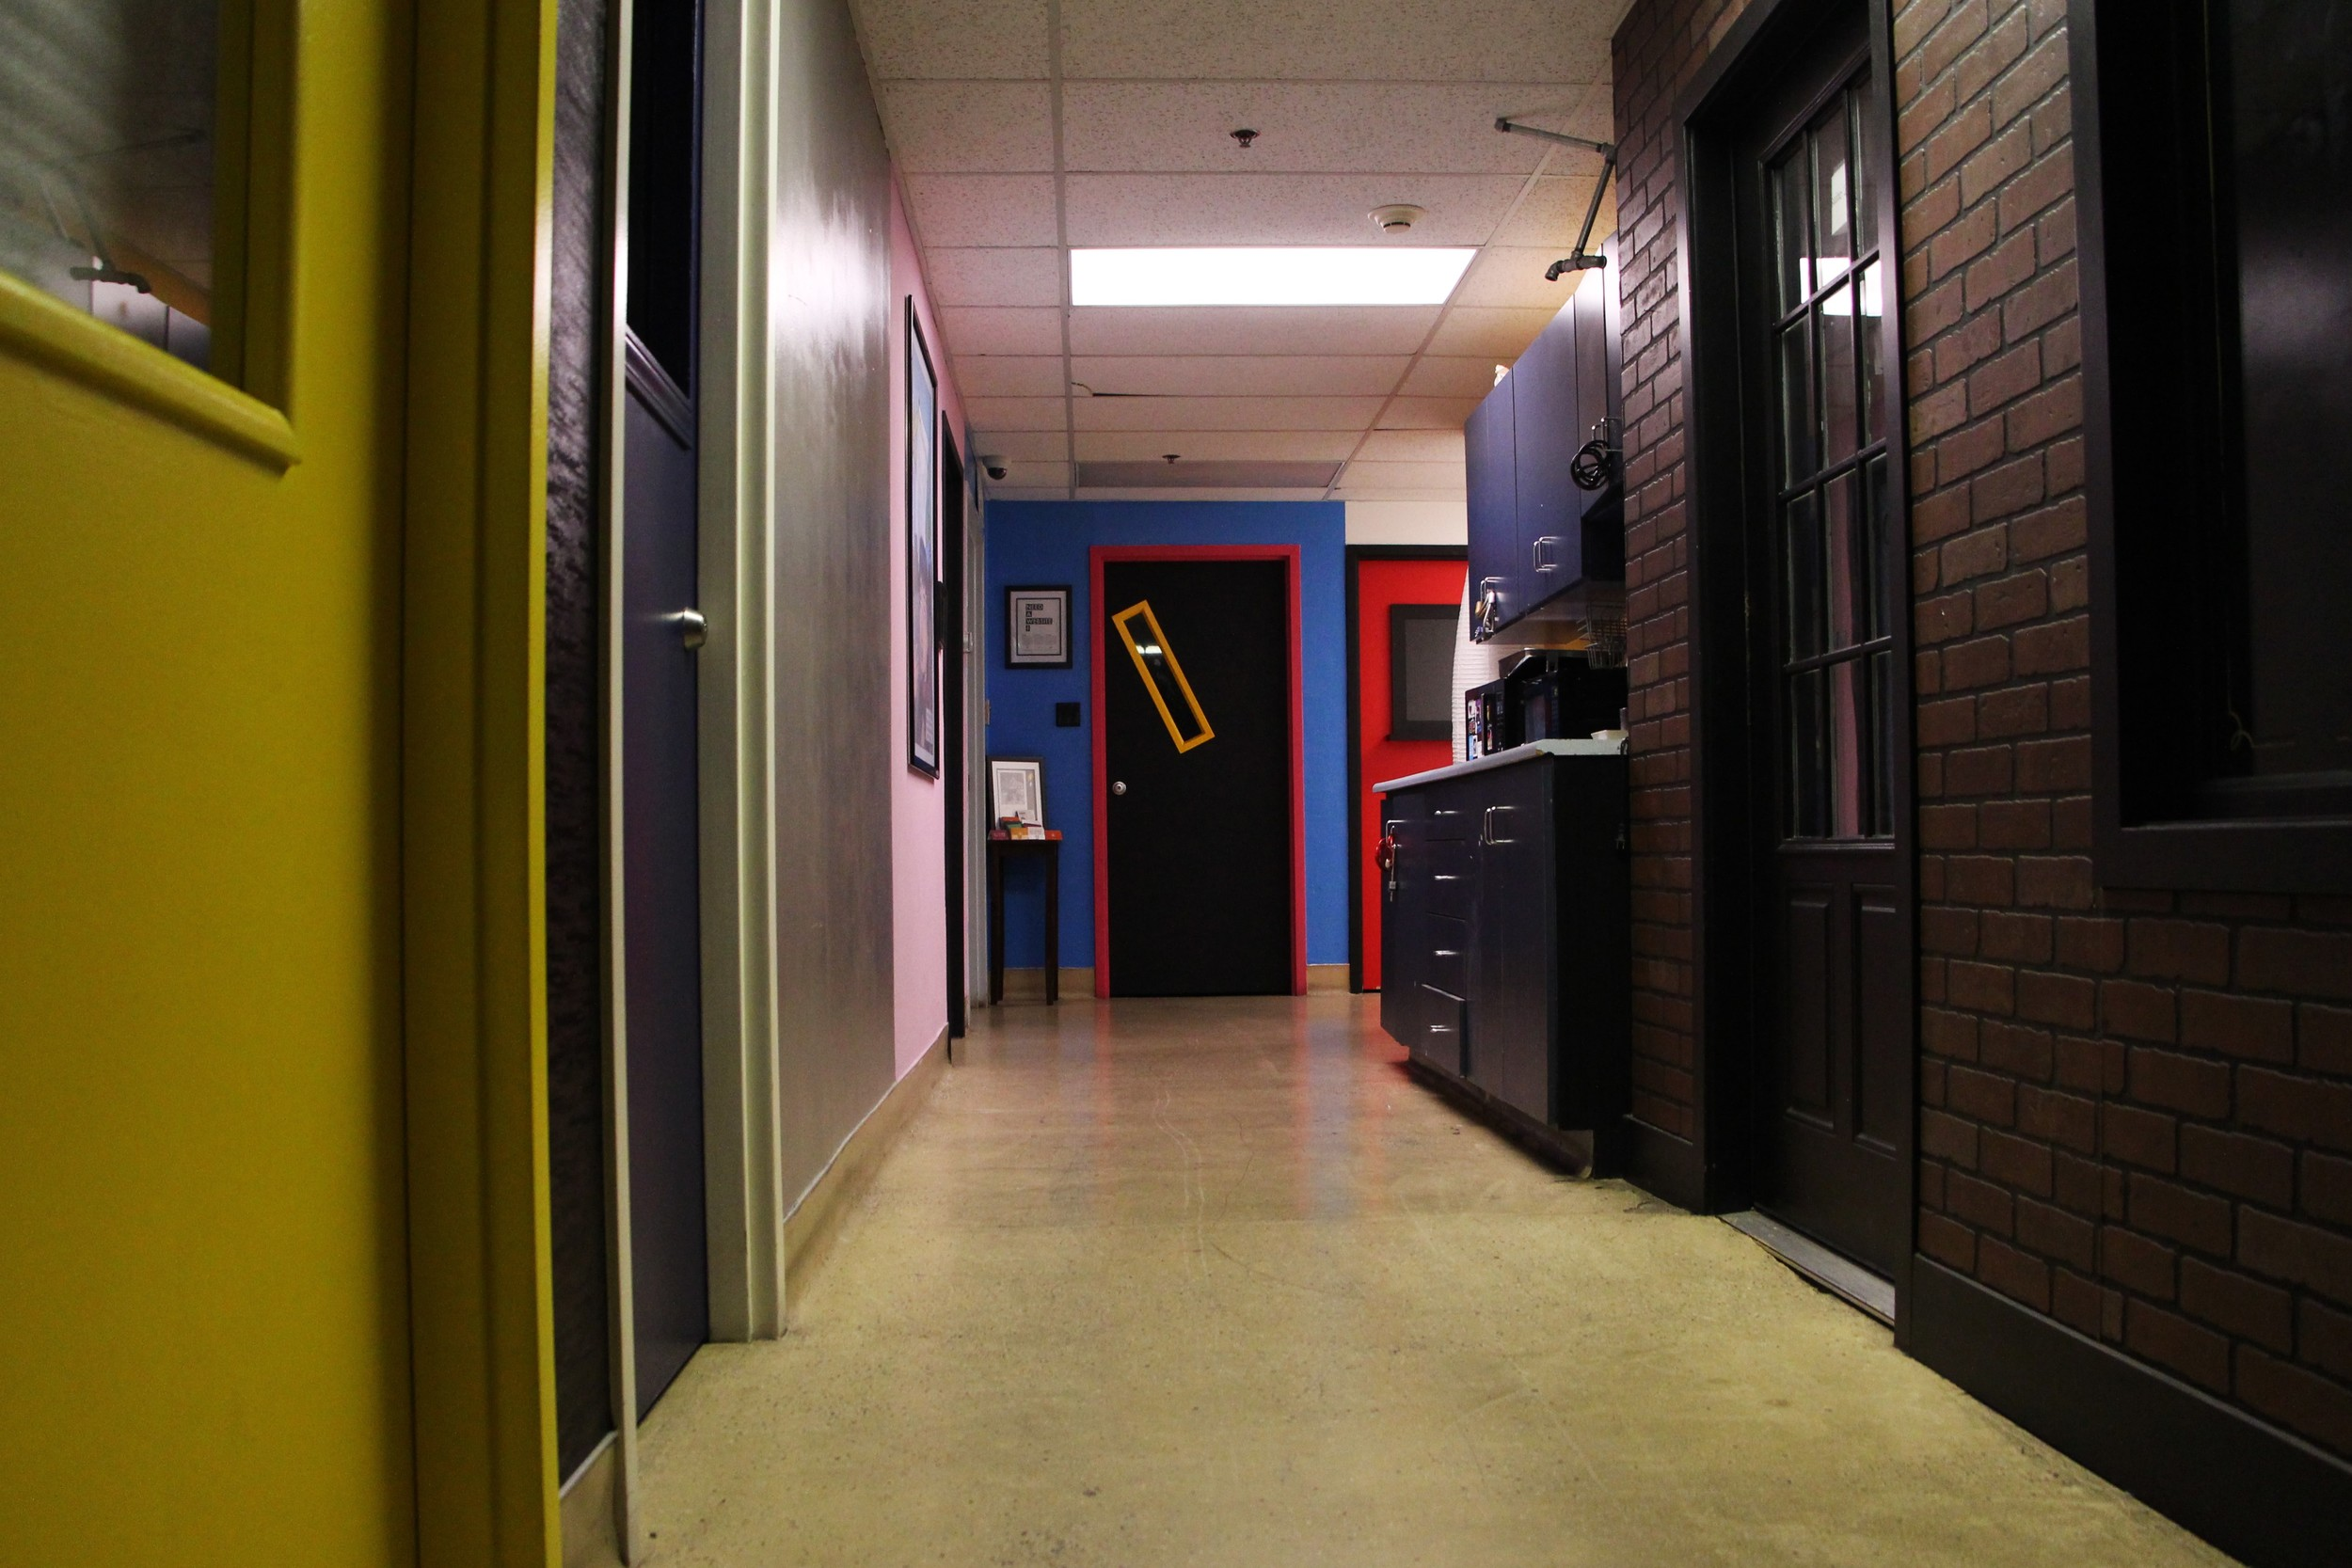 Hallway #2 Upstairs at Emergency Arts